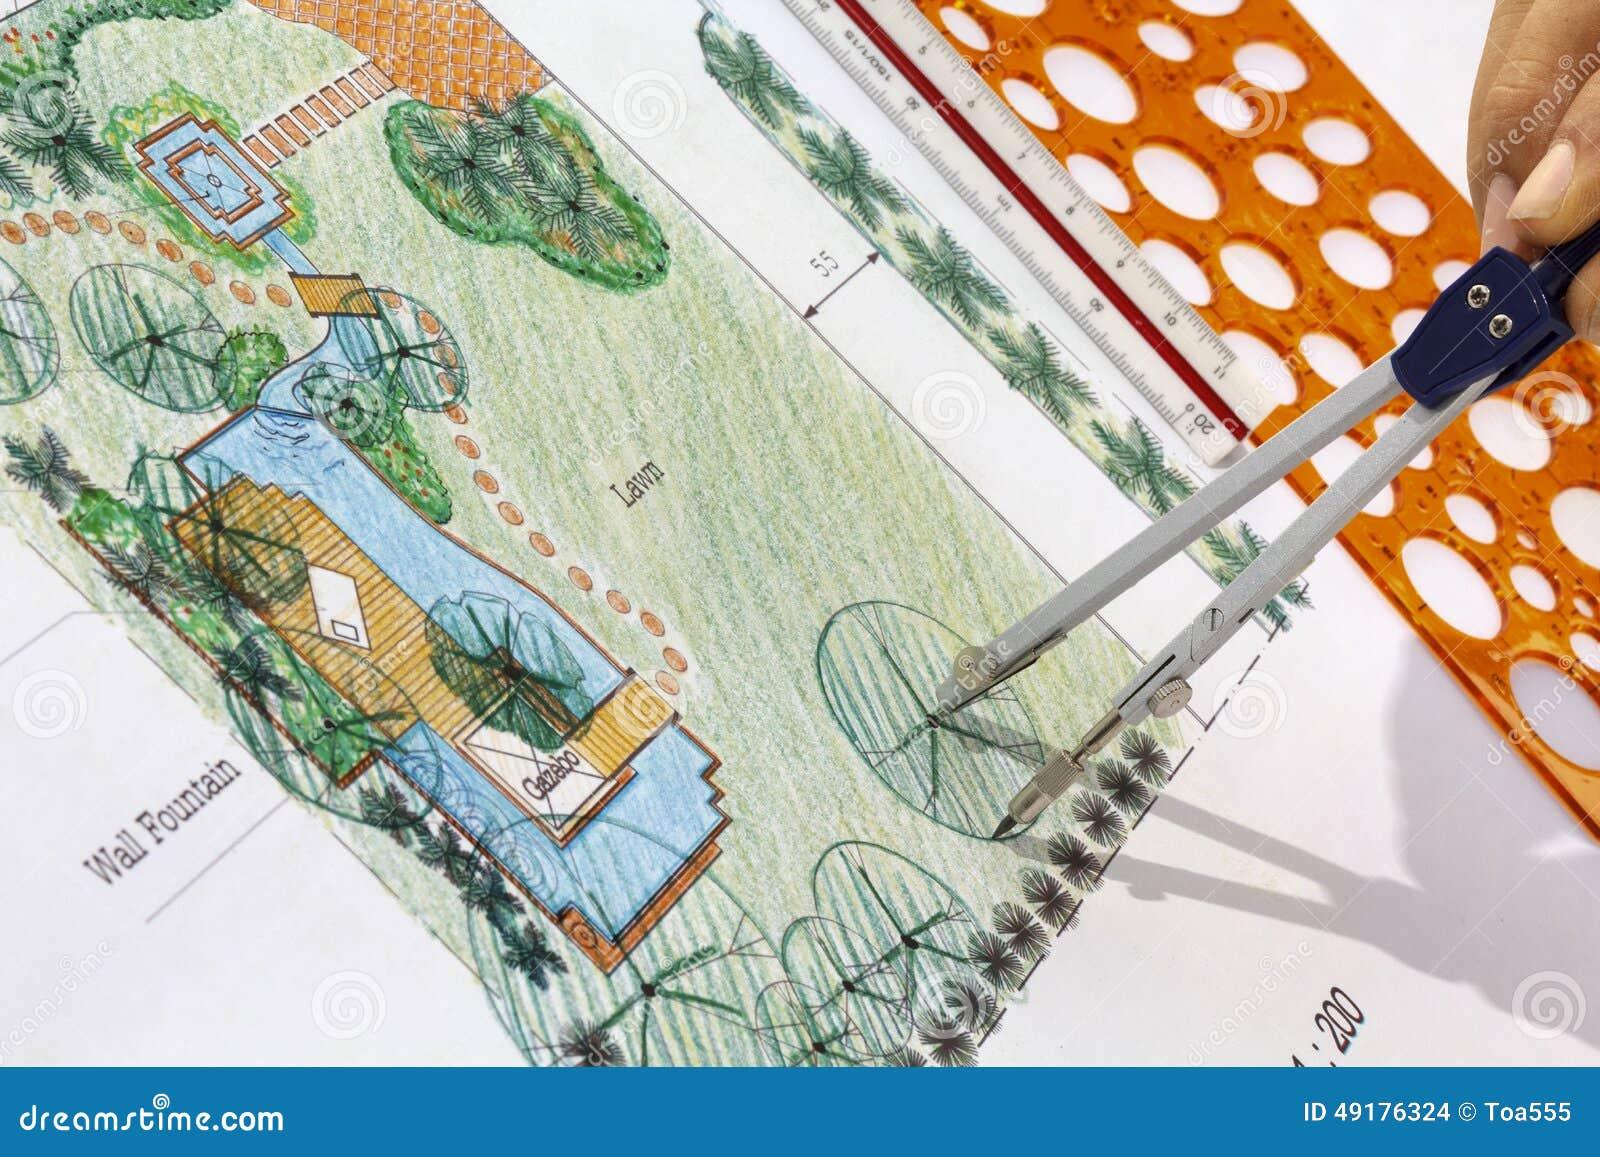 ... Architect Design Water Garden Plans Stock Photo - Image: 49176324